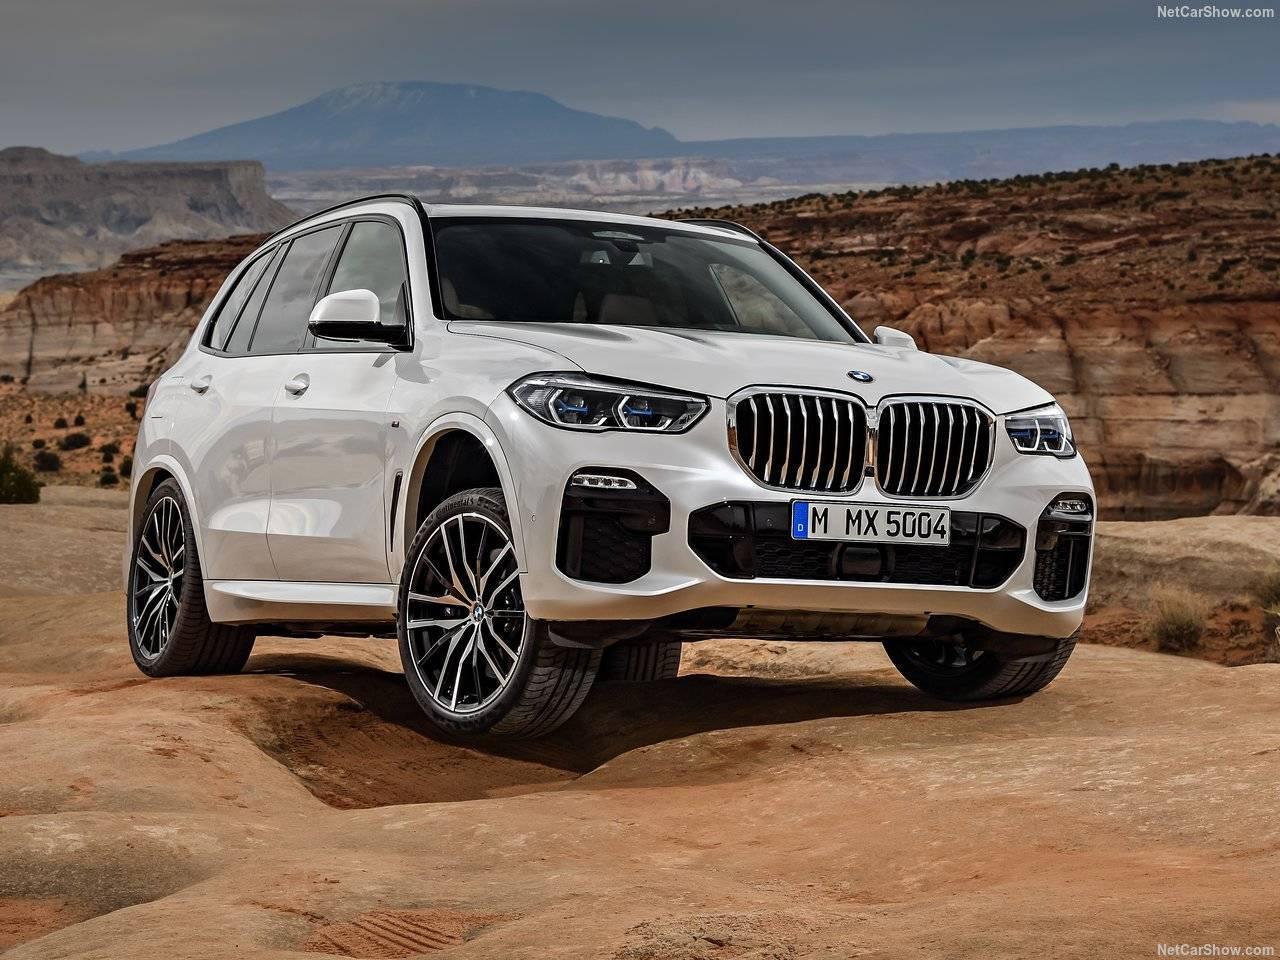 BMWから新型X5が始動、フロントフェイスが刷新され、パワートレイン等も改良?!